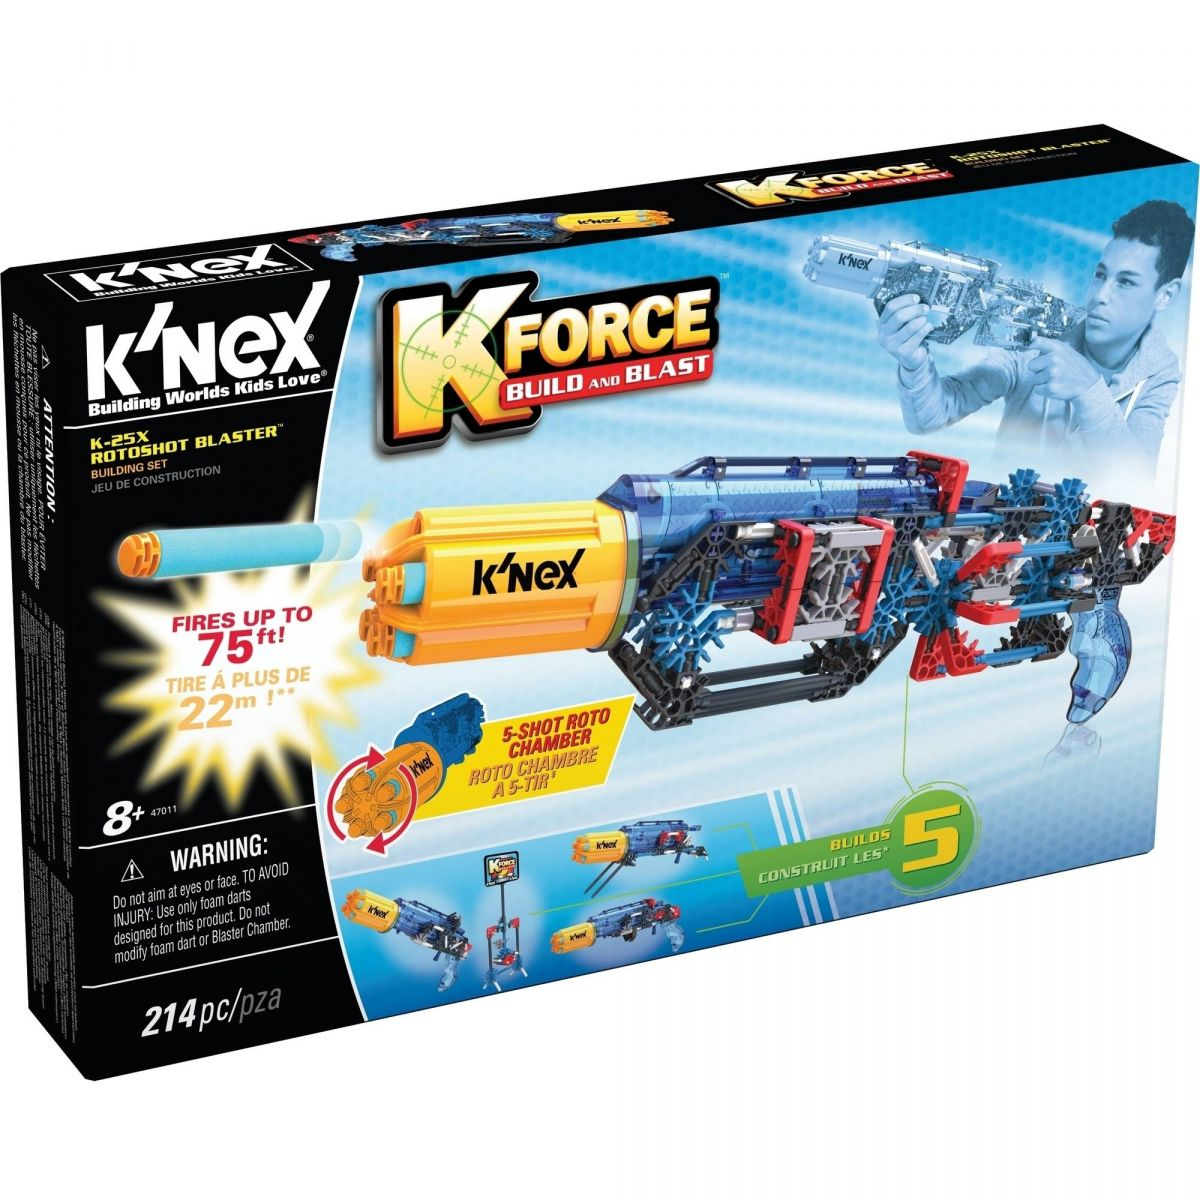 Knex Stavebnice Pistole K 25X Roto Blaster